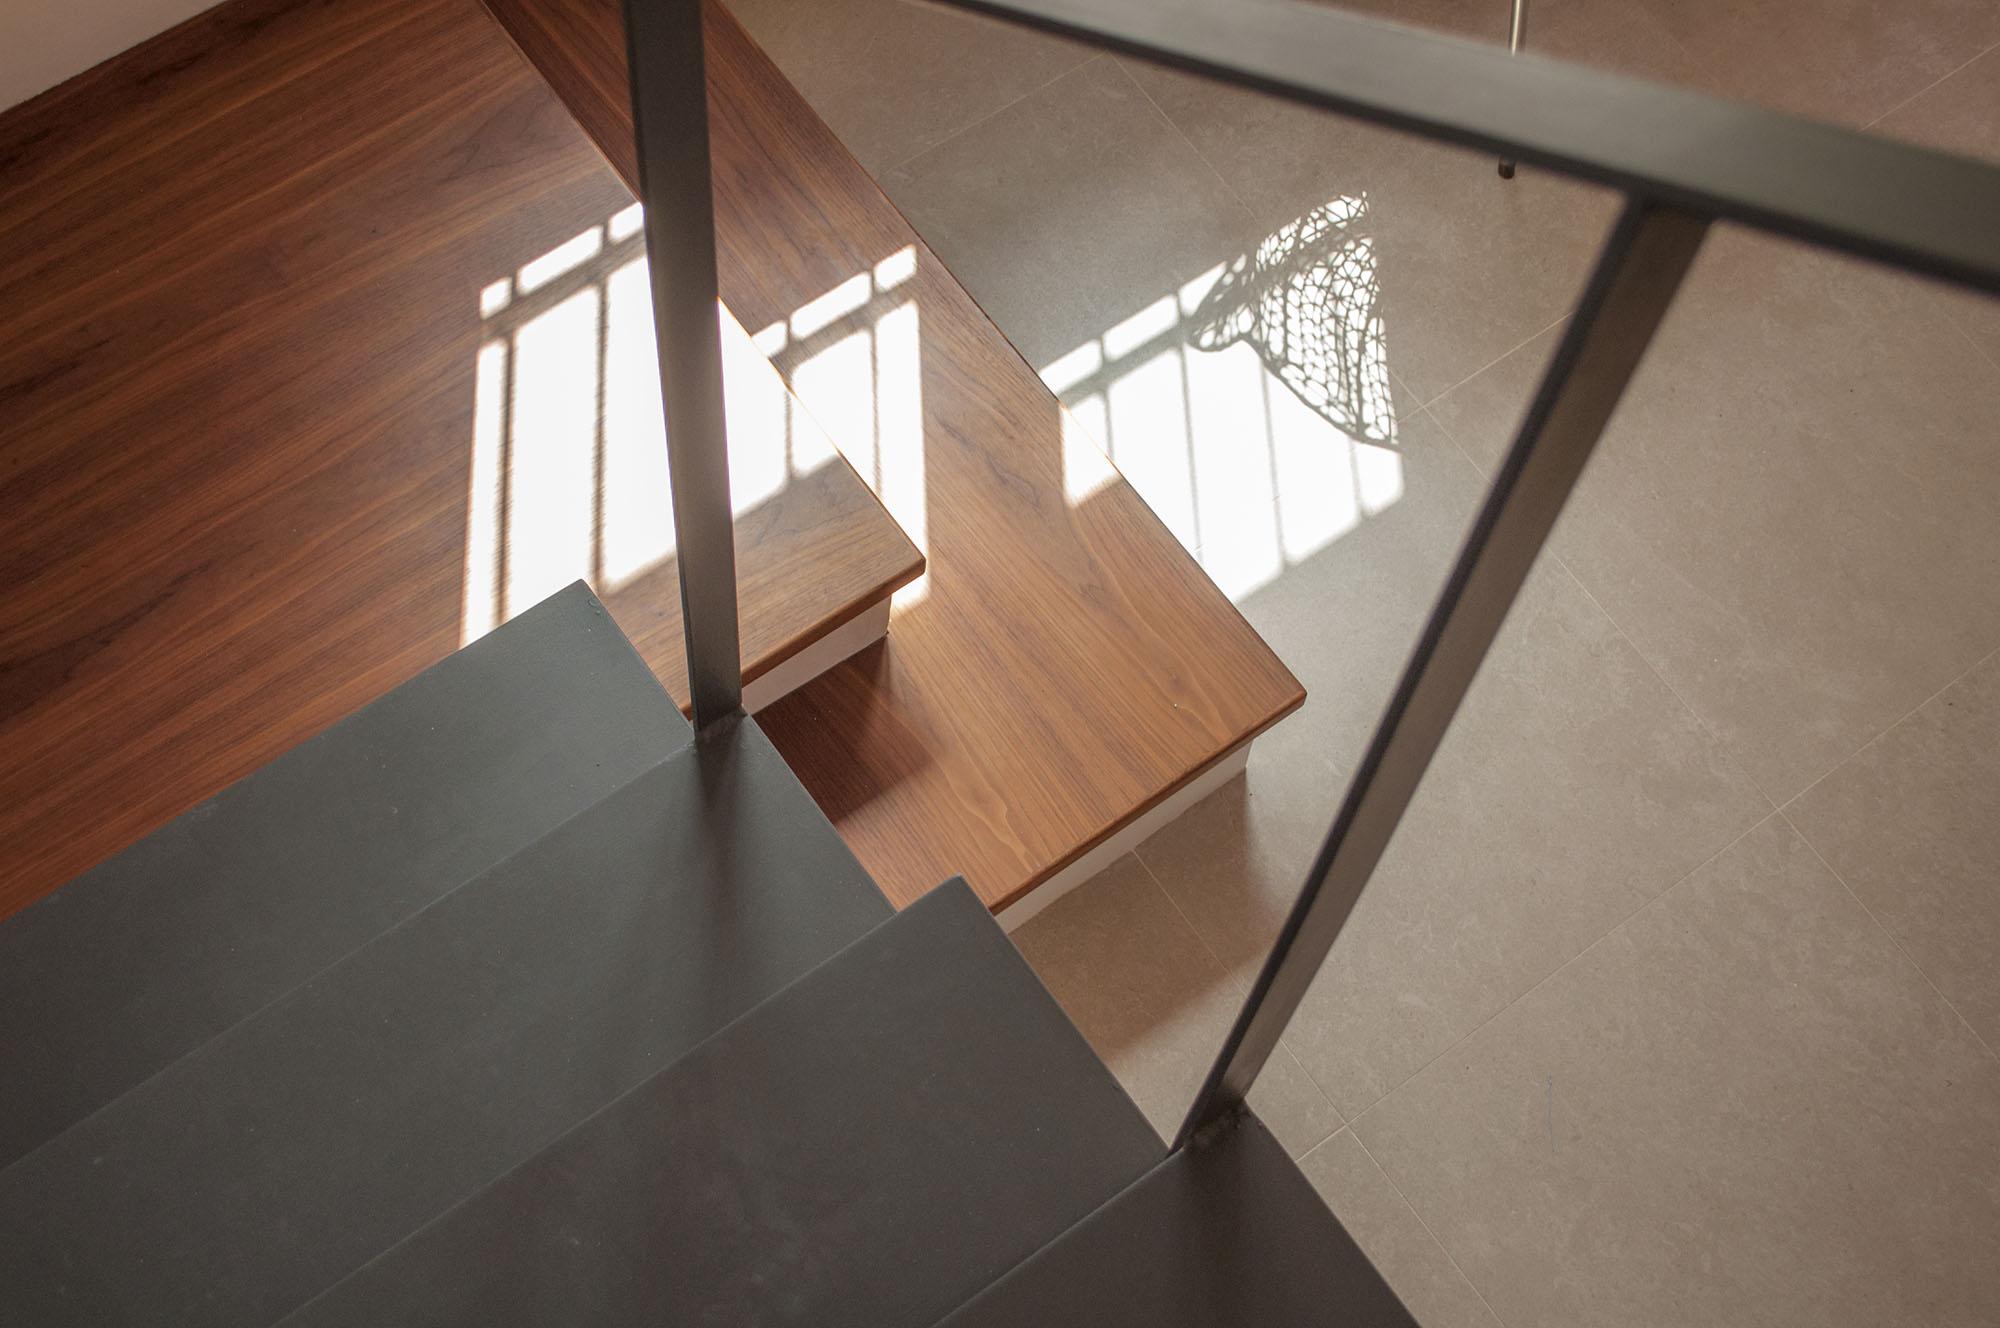 Arquitectura e dise o interior en barcelona y sitges - Diseno interiores barcelona ...